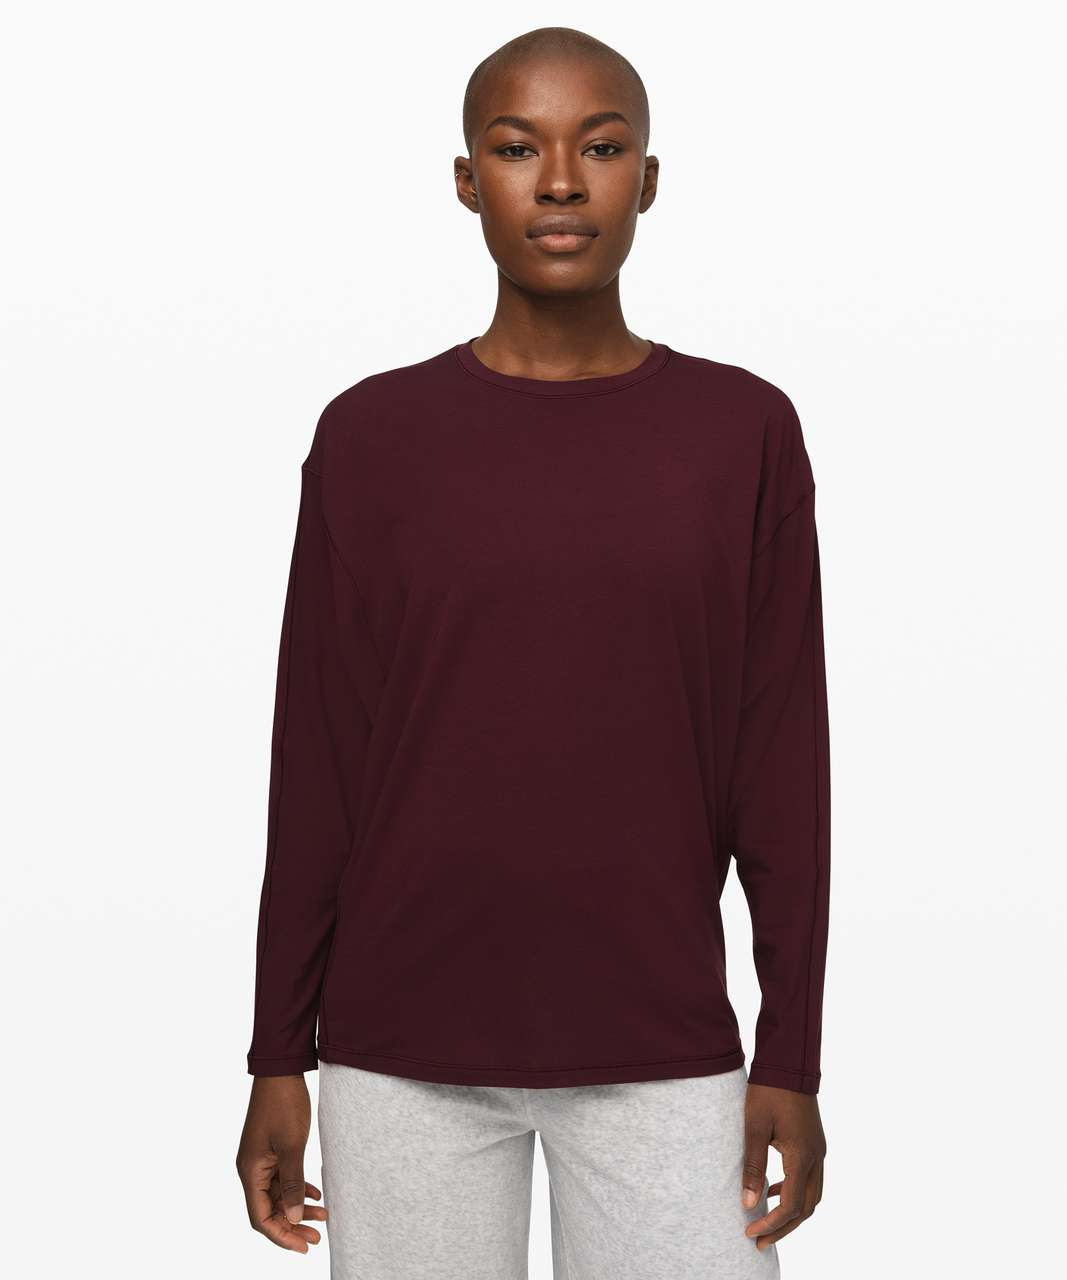 Lululemon Loungeful Drape Long Sleeve - Garnet